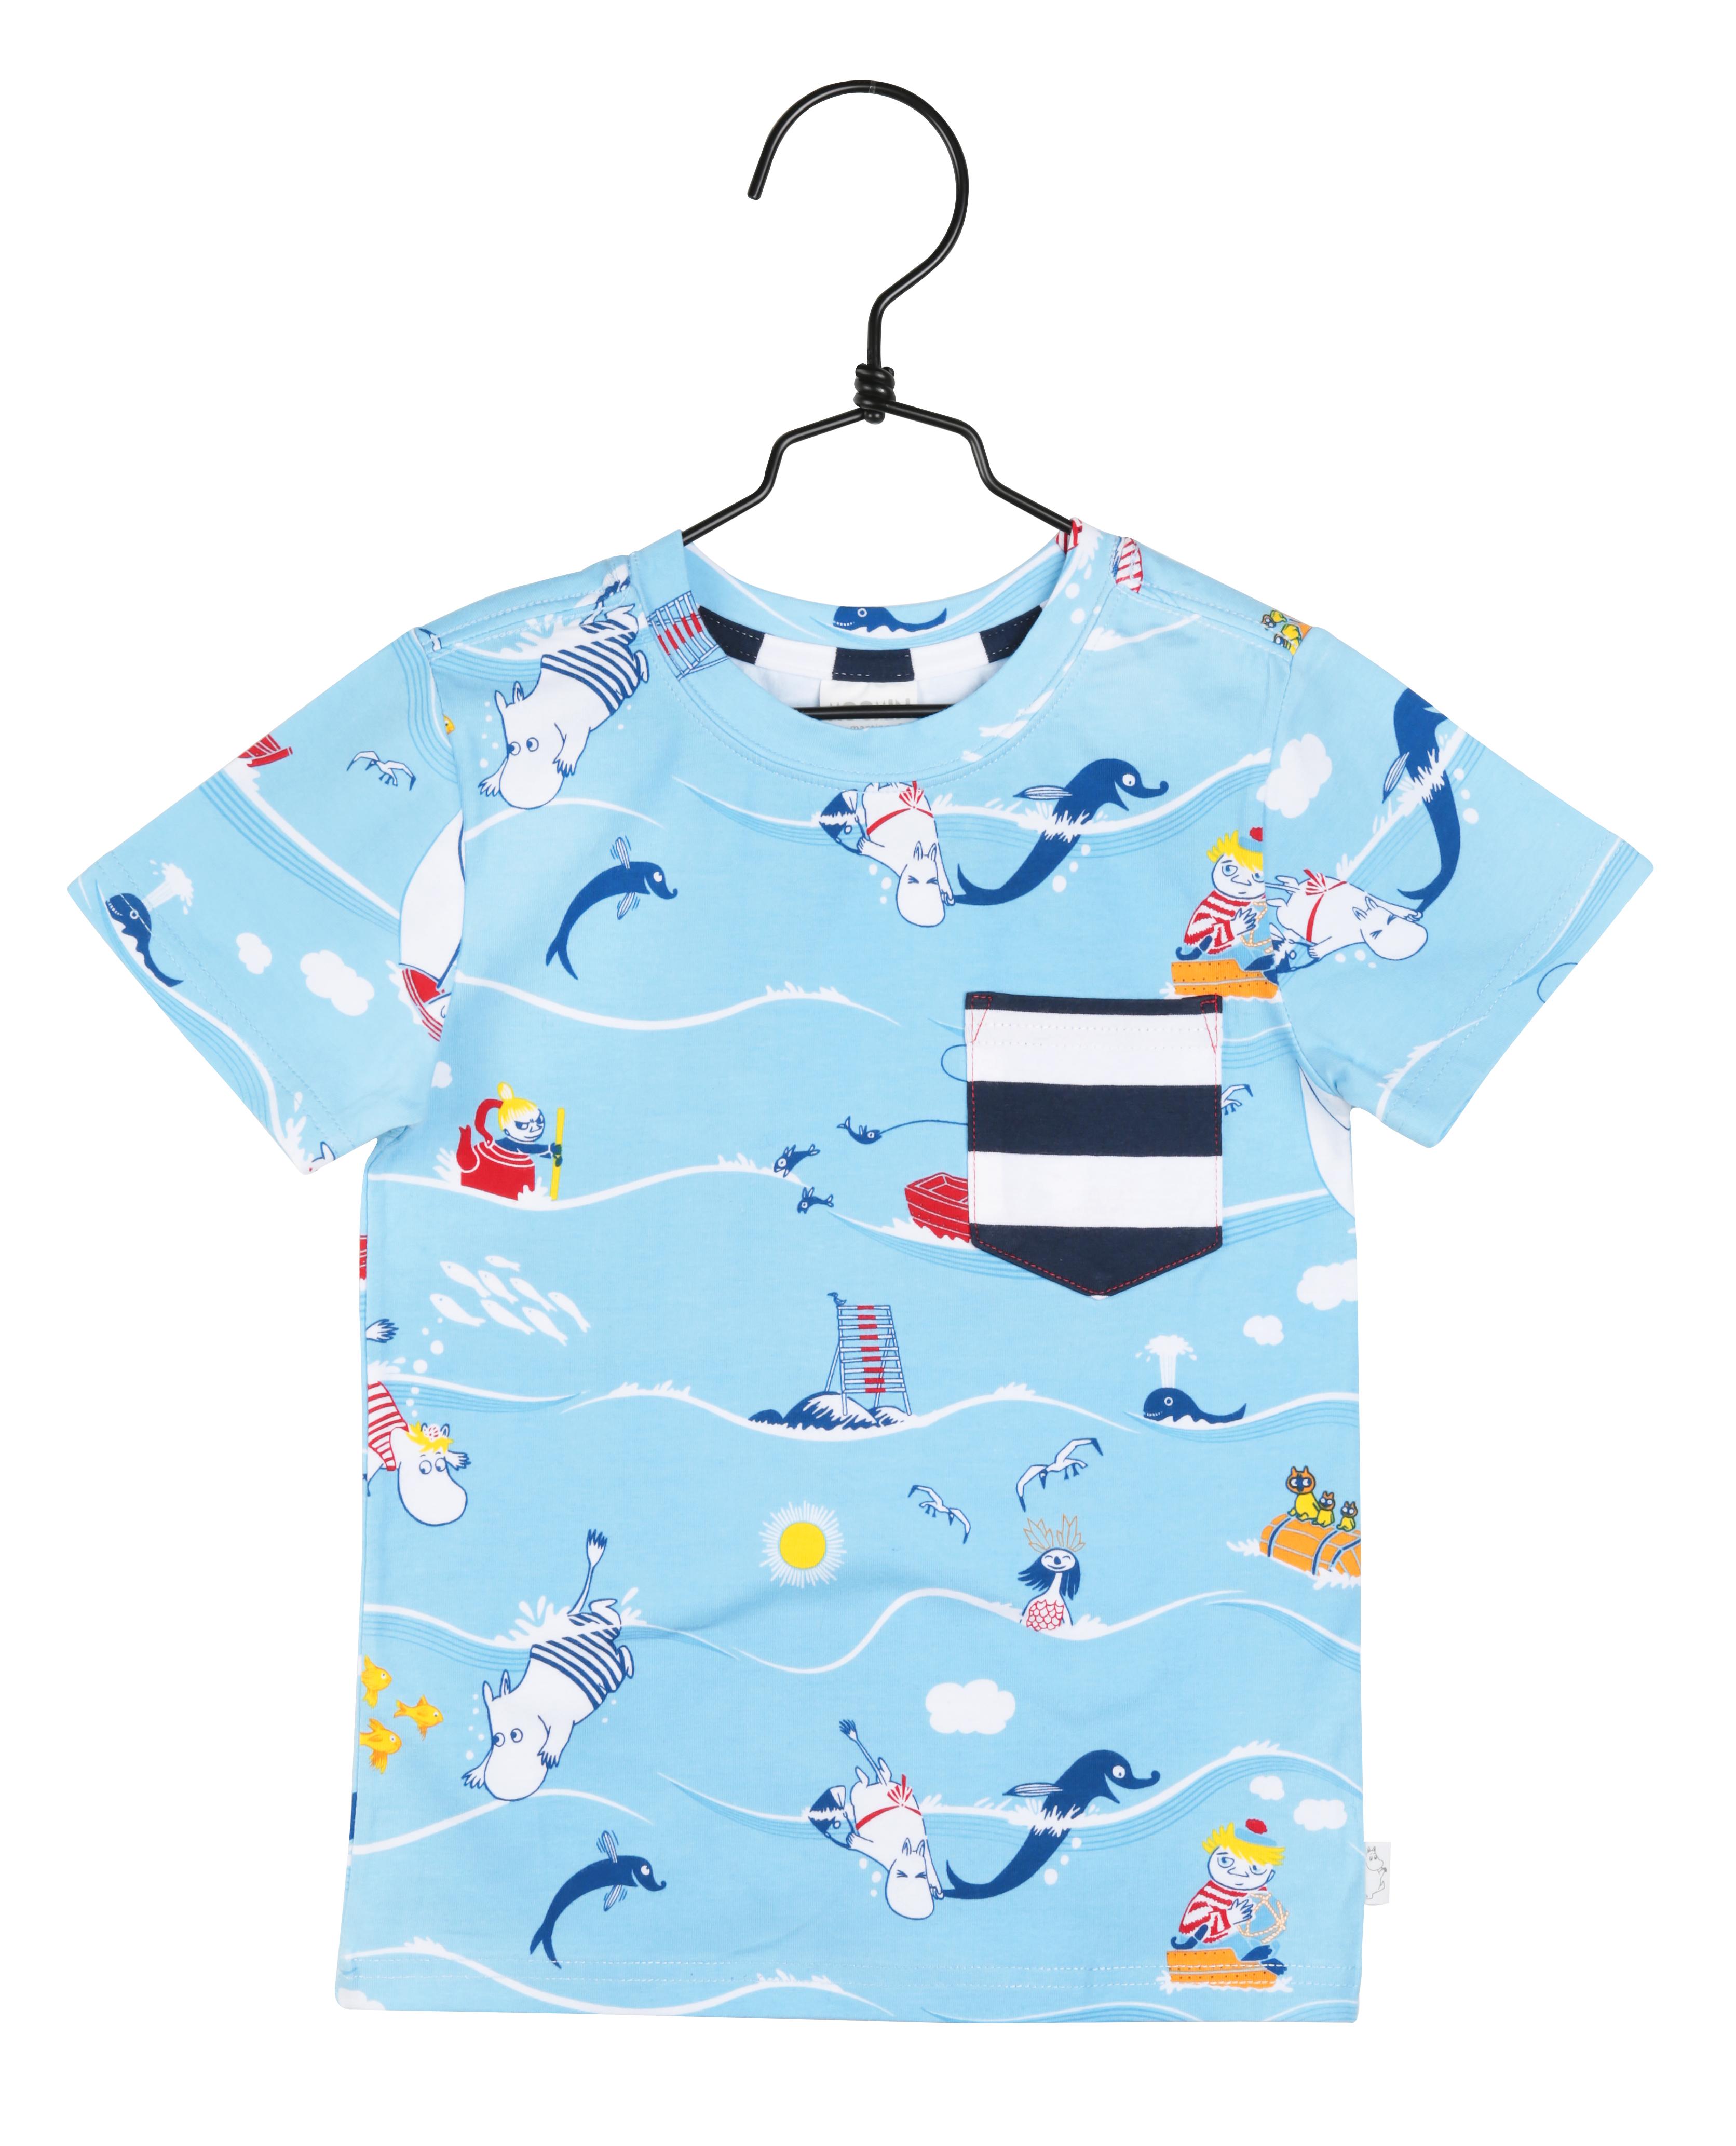 Martinex Moomin Splash T-Shirt